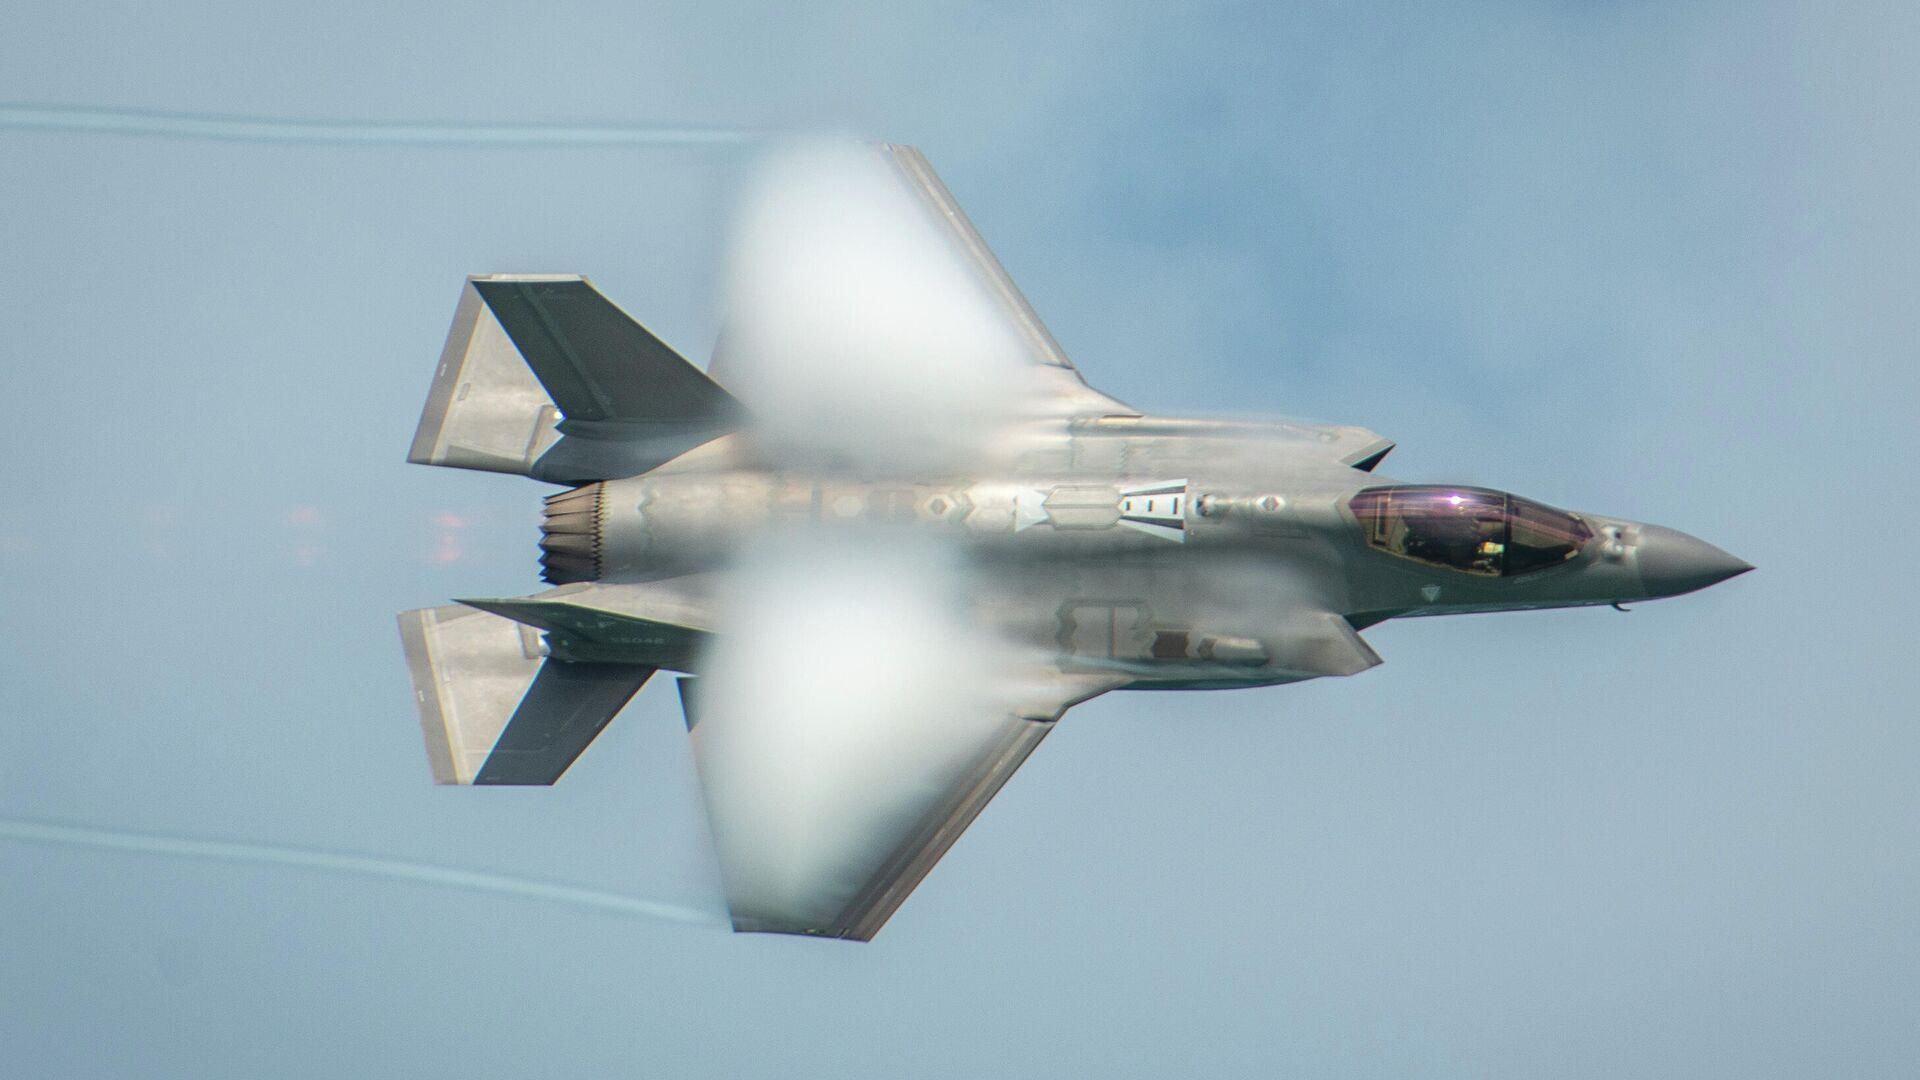 Американский истребитель F-35A Lightning II - РИА Новости, 1920, 01.03.2021